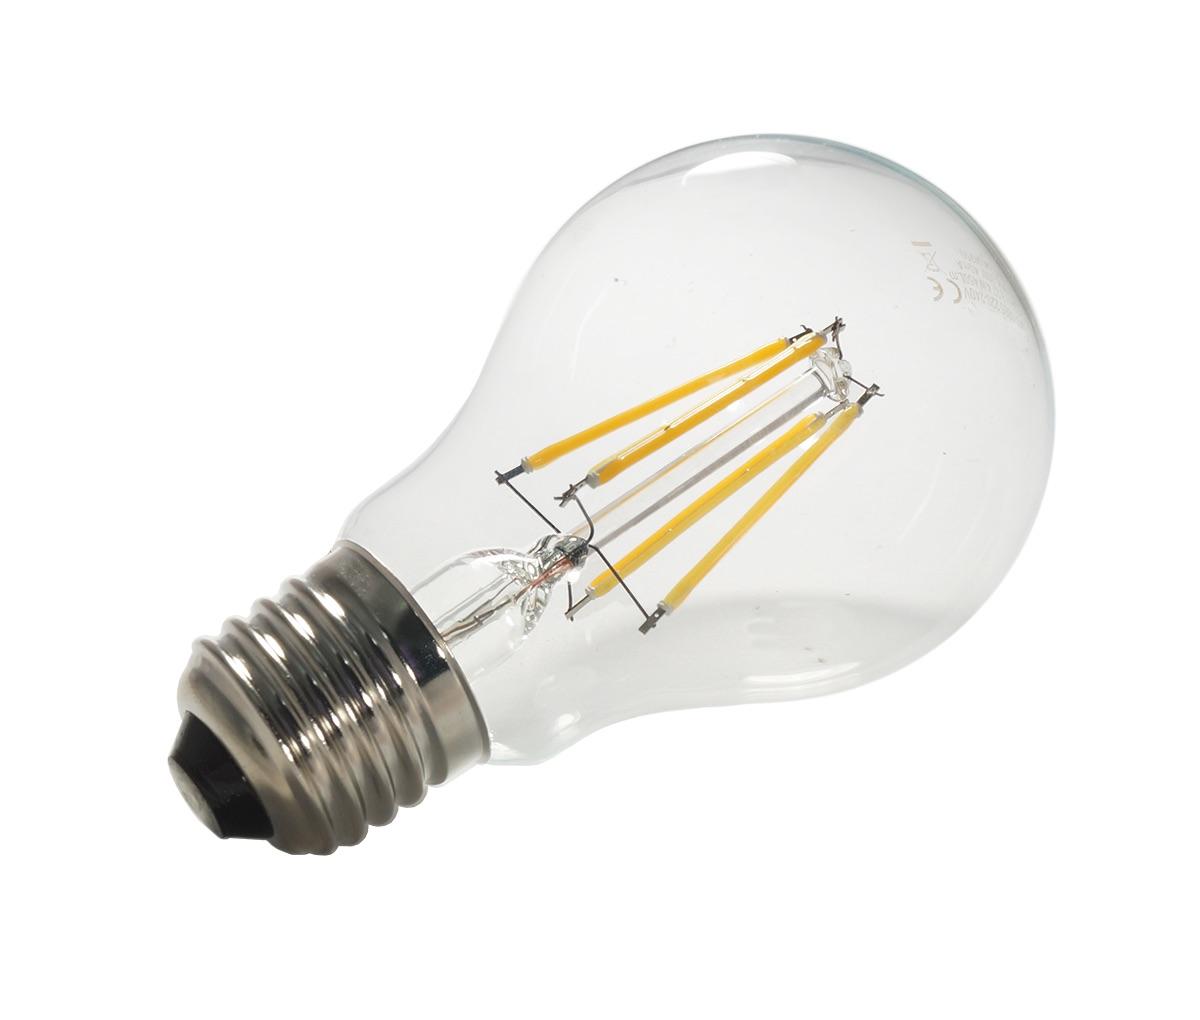 Effetti del forum le lampadine a led pagina 1 casa for Lampadine led 5 watt